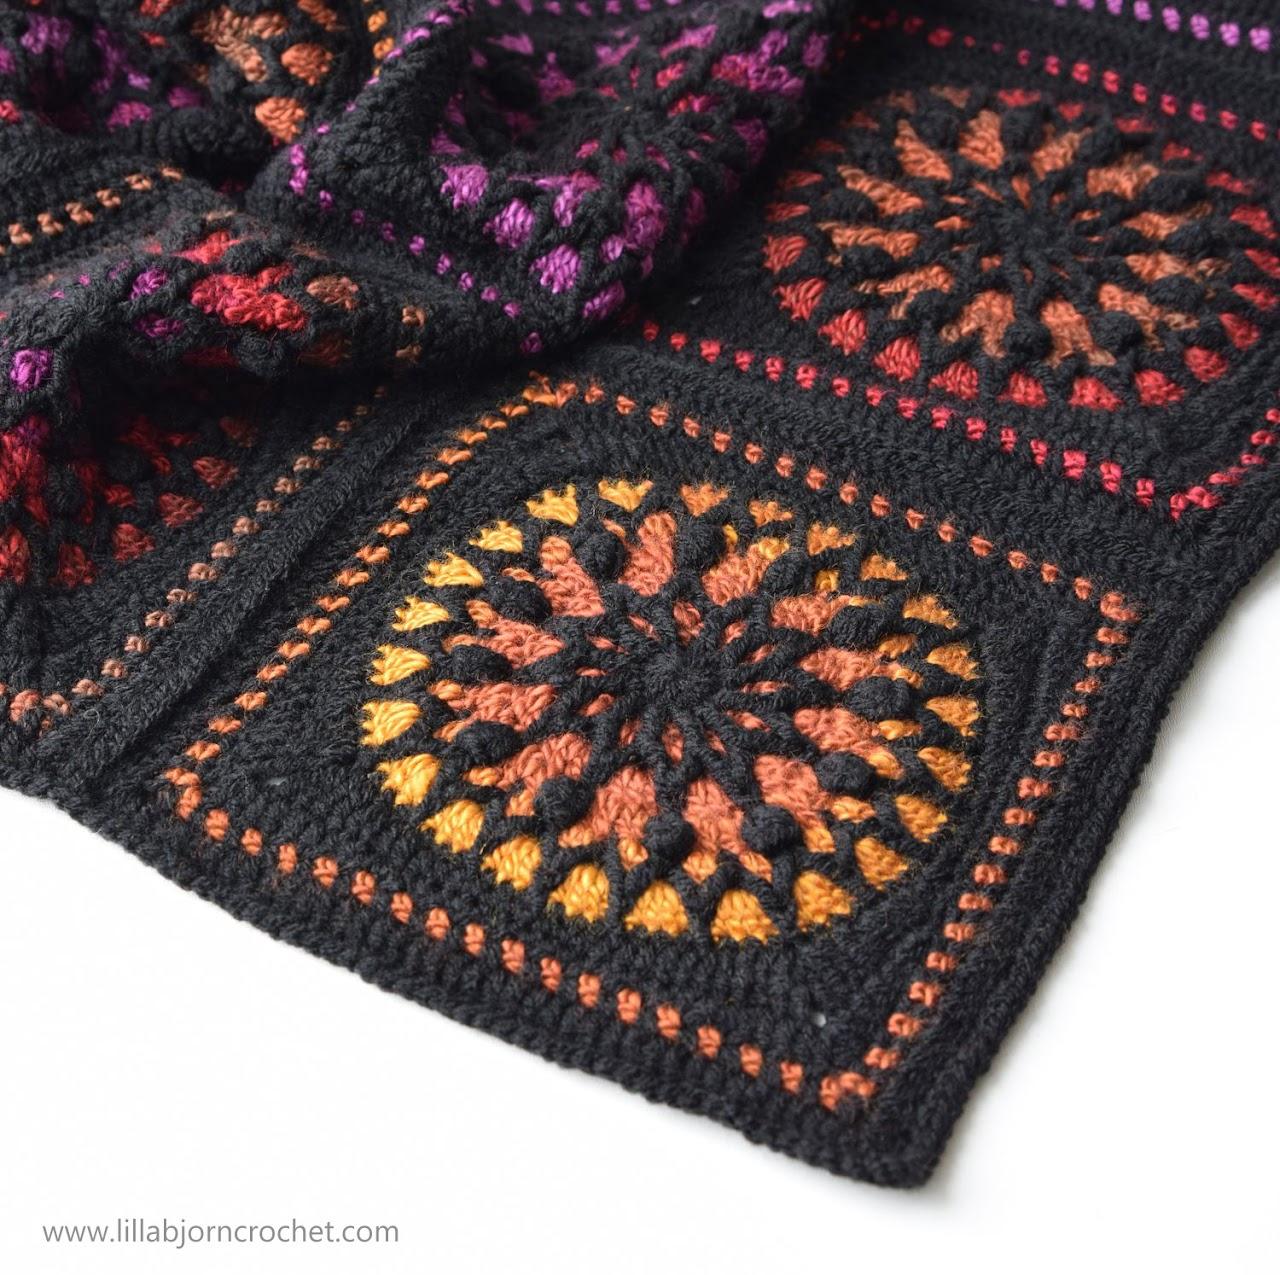 Stained Glass crochet square - pattern by www.lillabjorncrochet.com